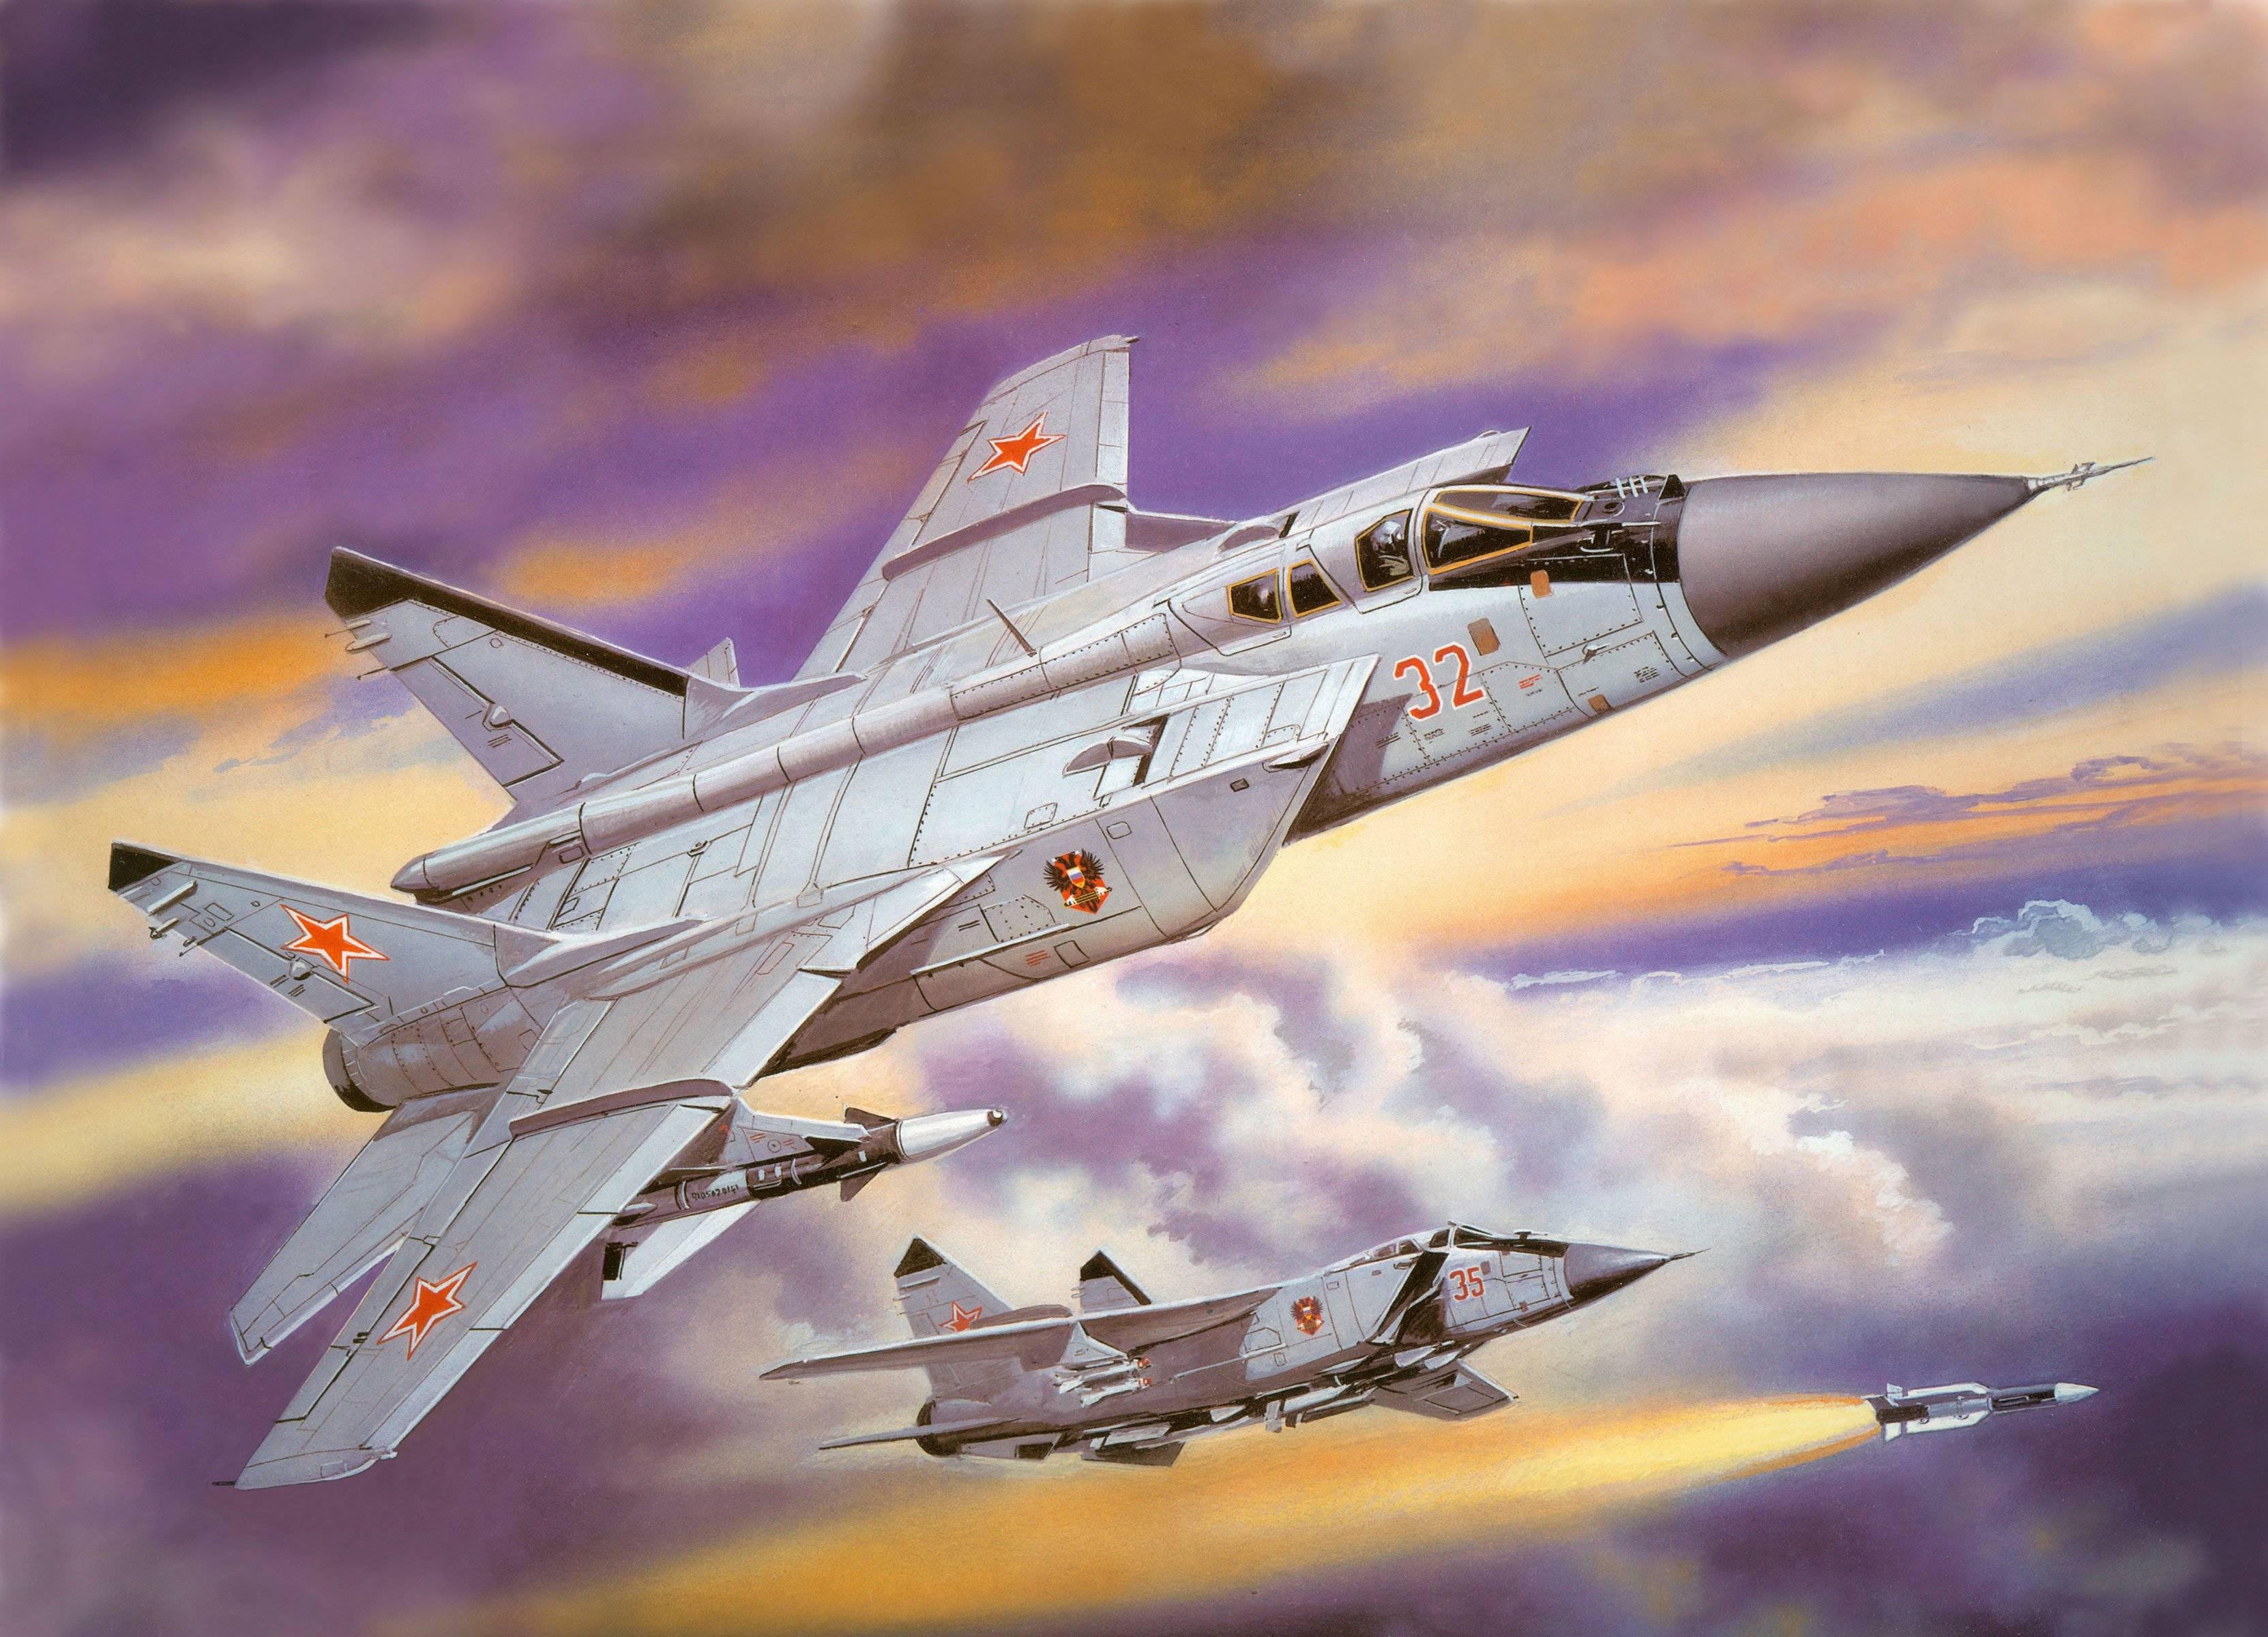 wallpaper mig 23 fighter - photo #17